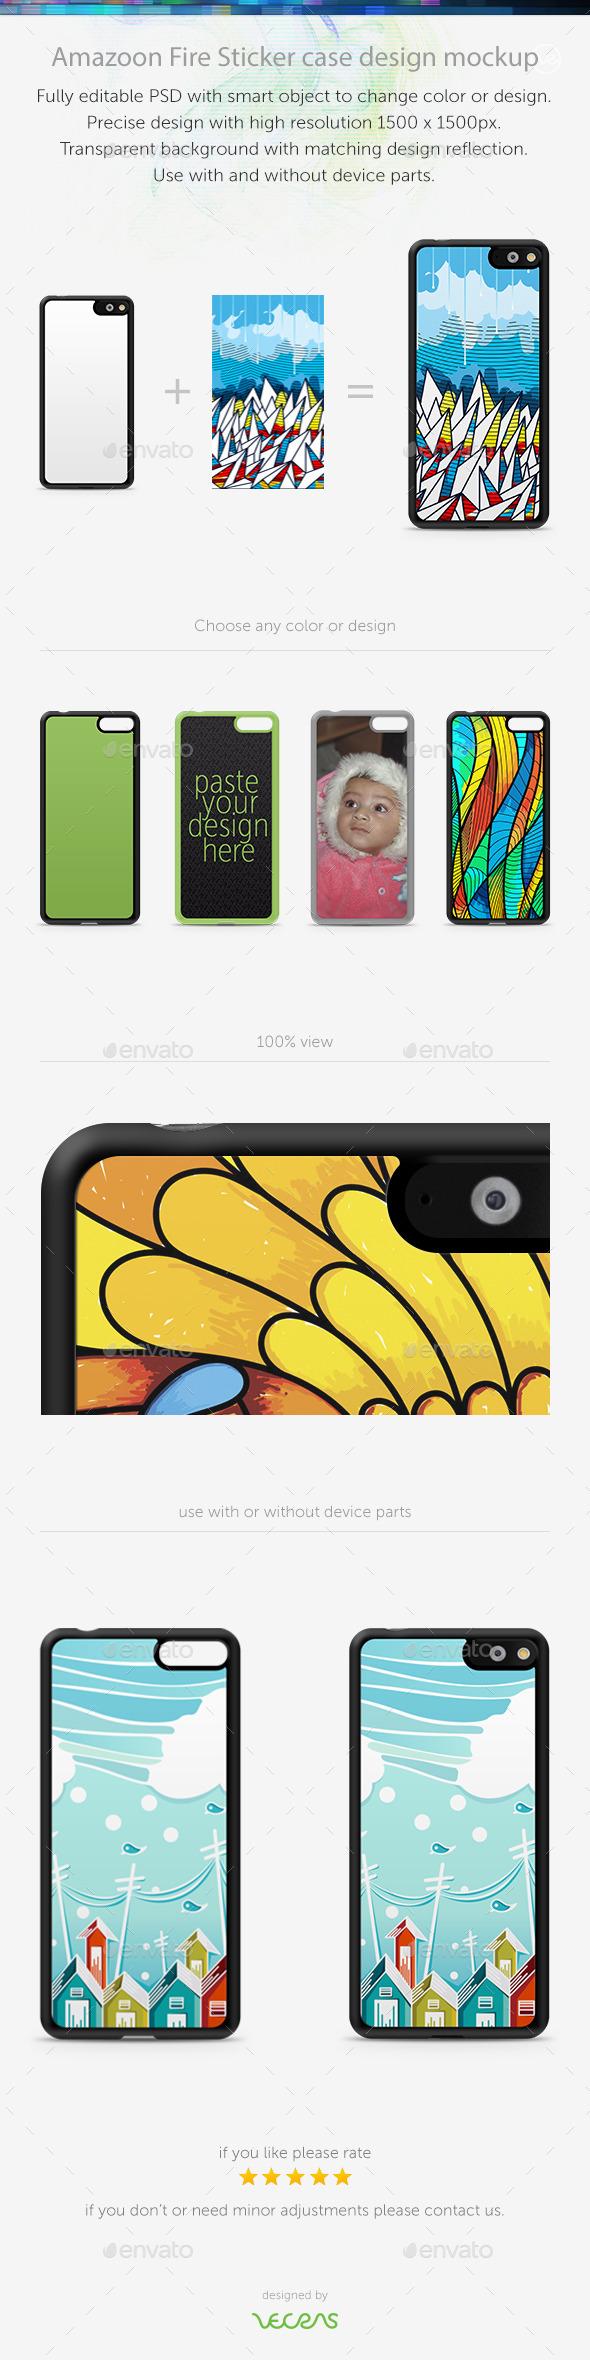 Amazoon Fire Sticker Case Design Mockup